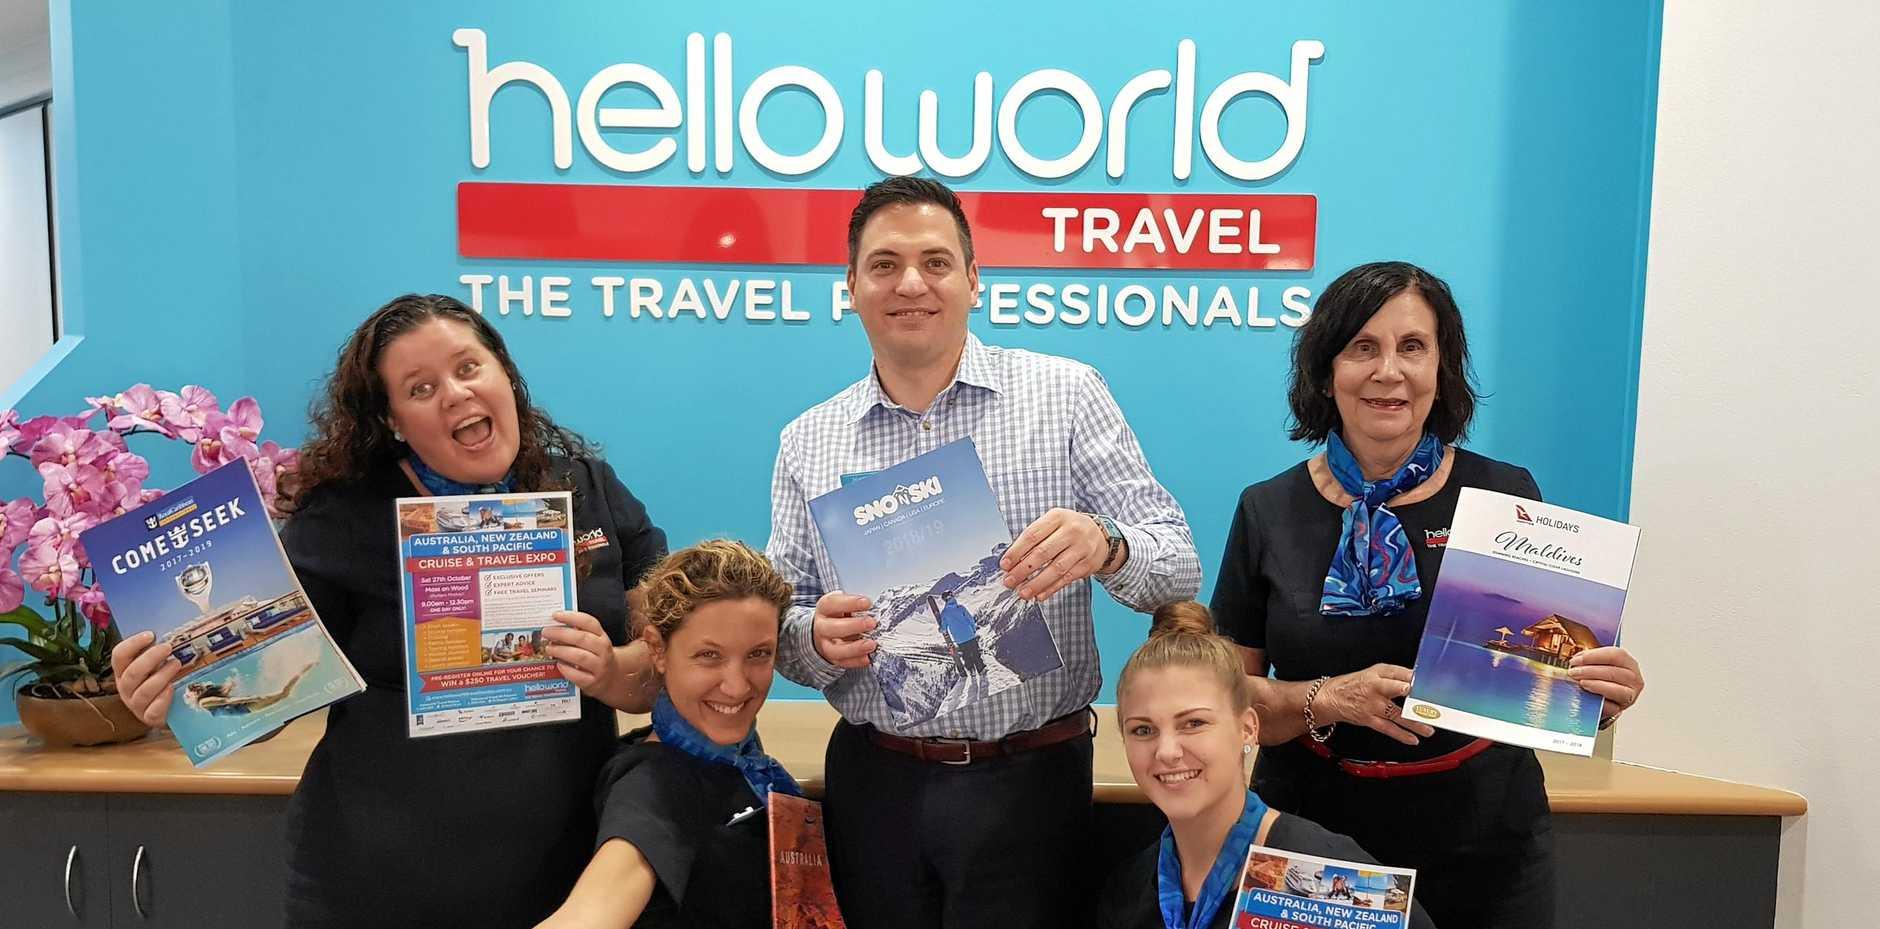 The Helloworld Travel Mt Pleasant team.